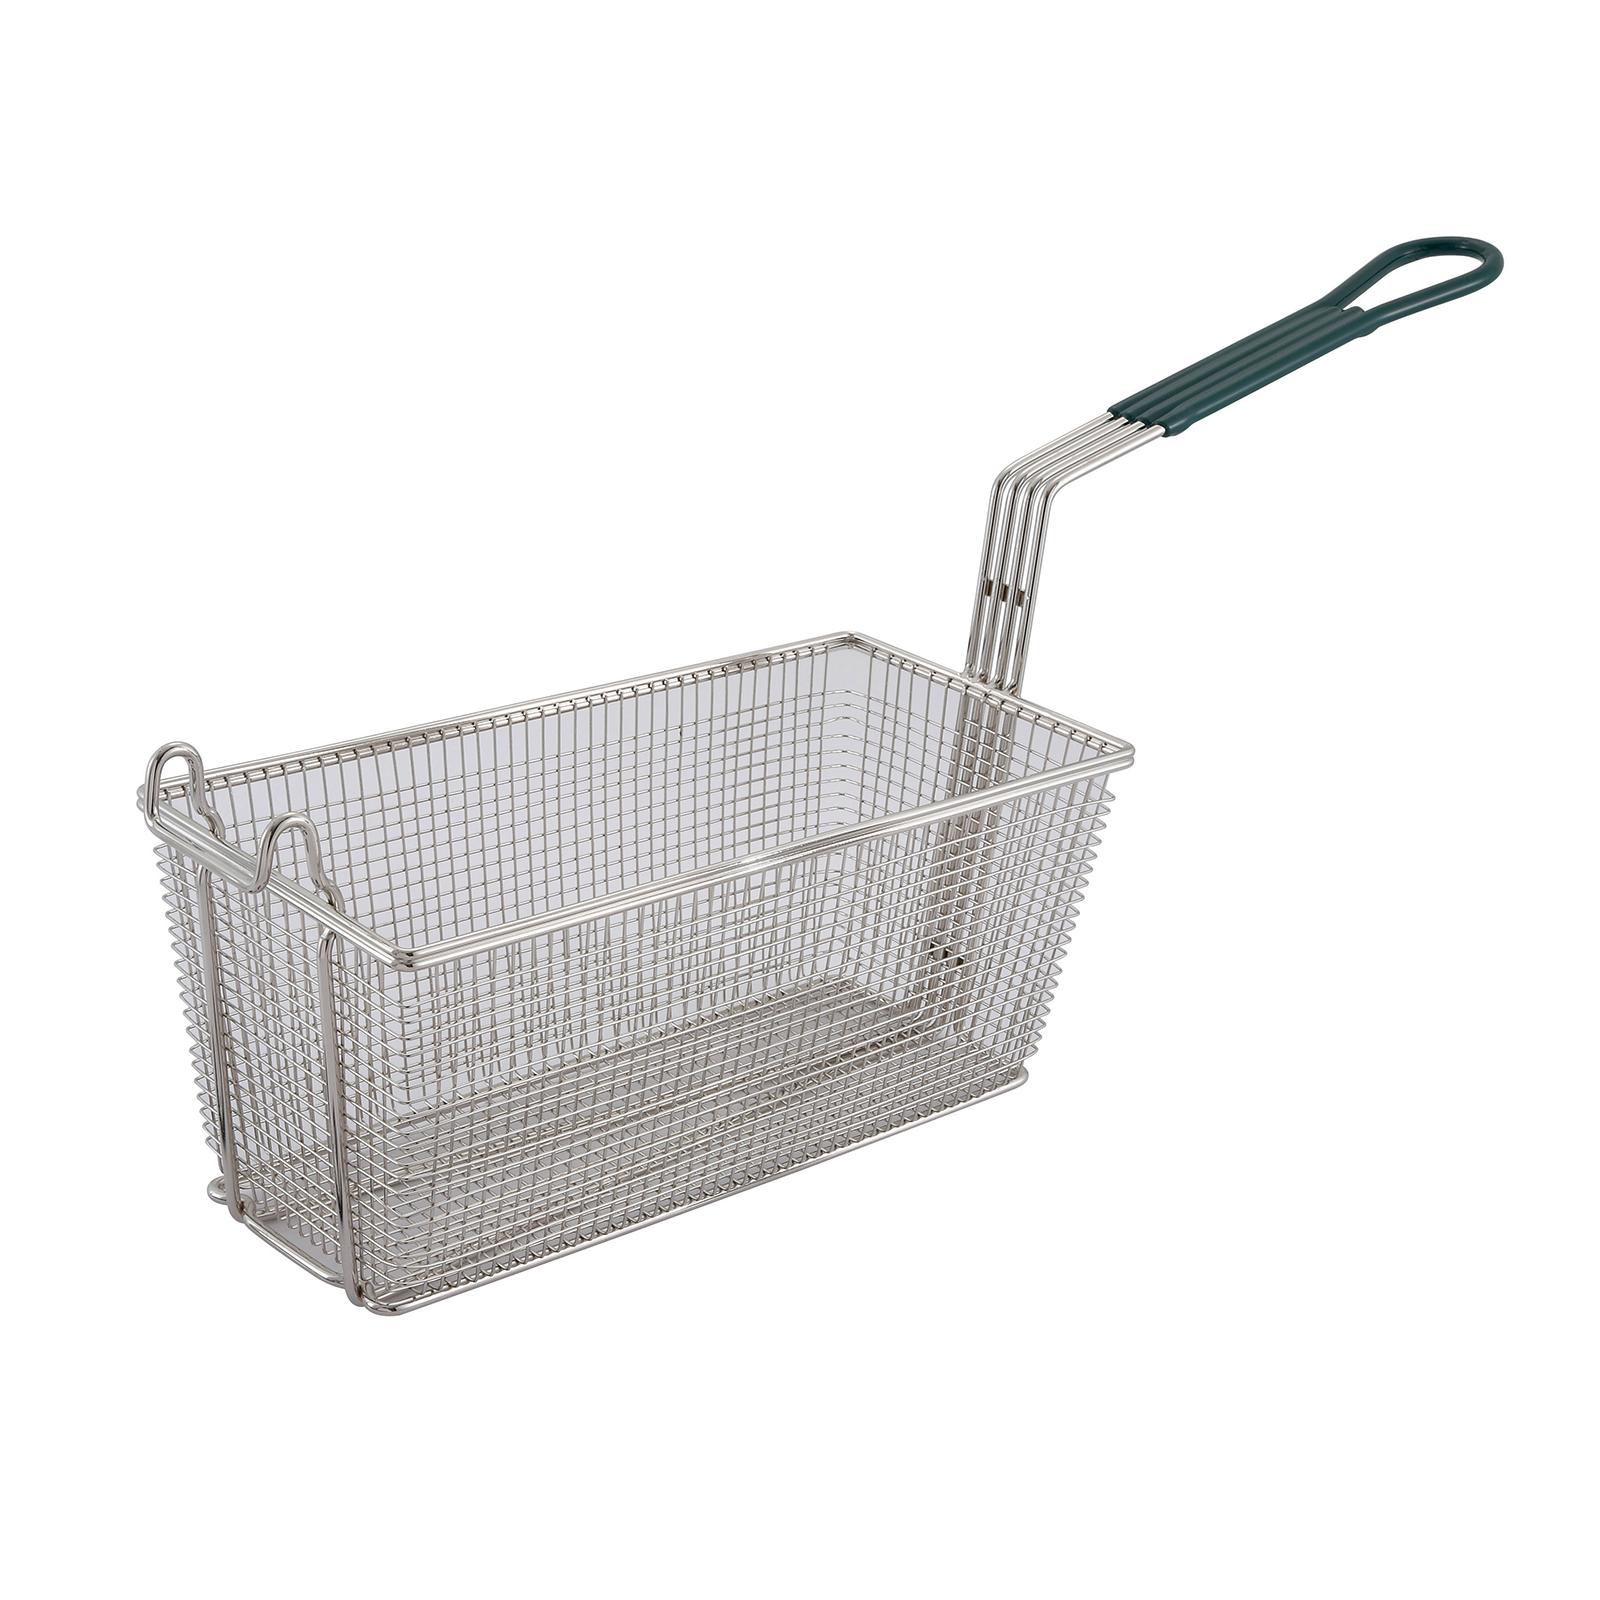 1600-17 Winco FB-30 fryer basket